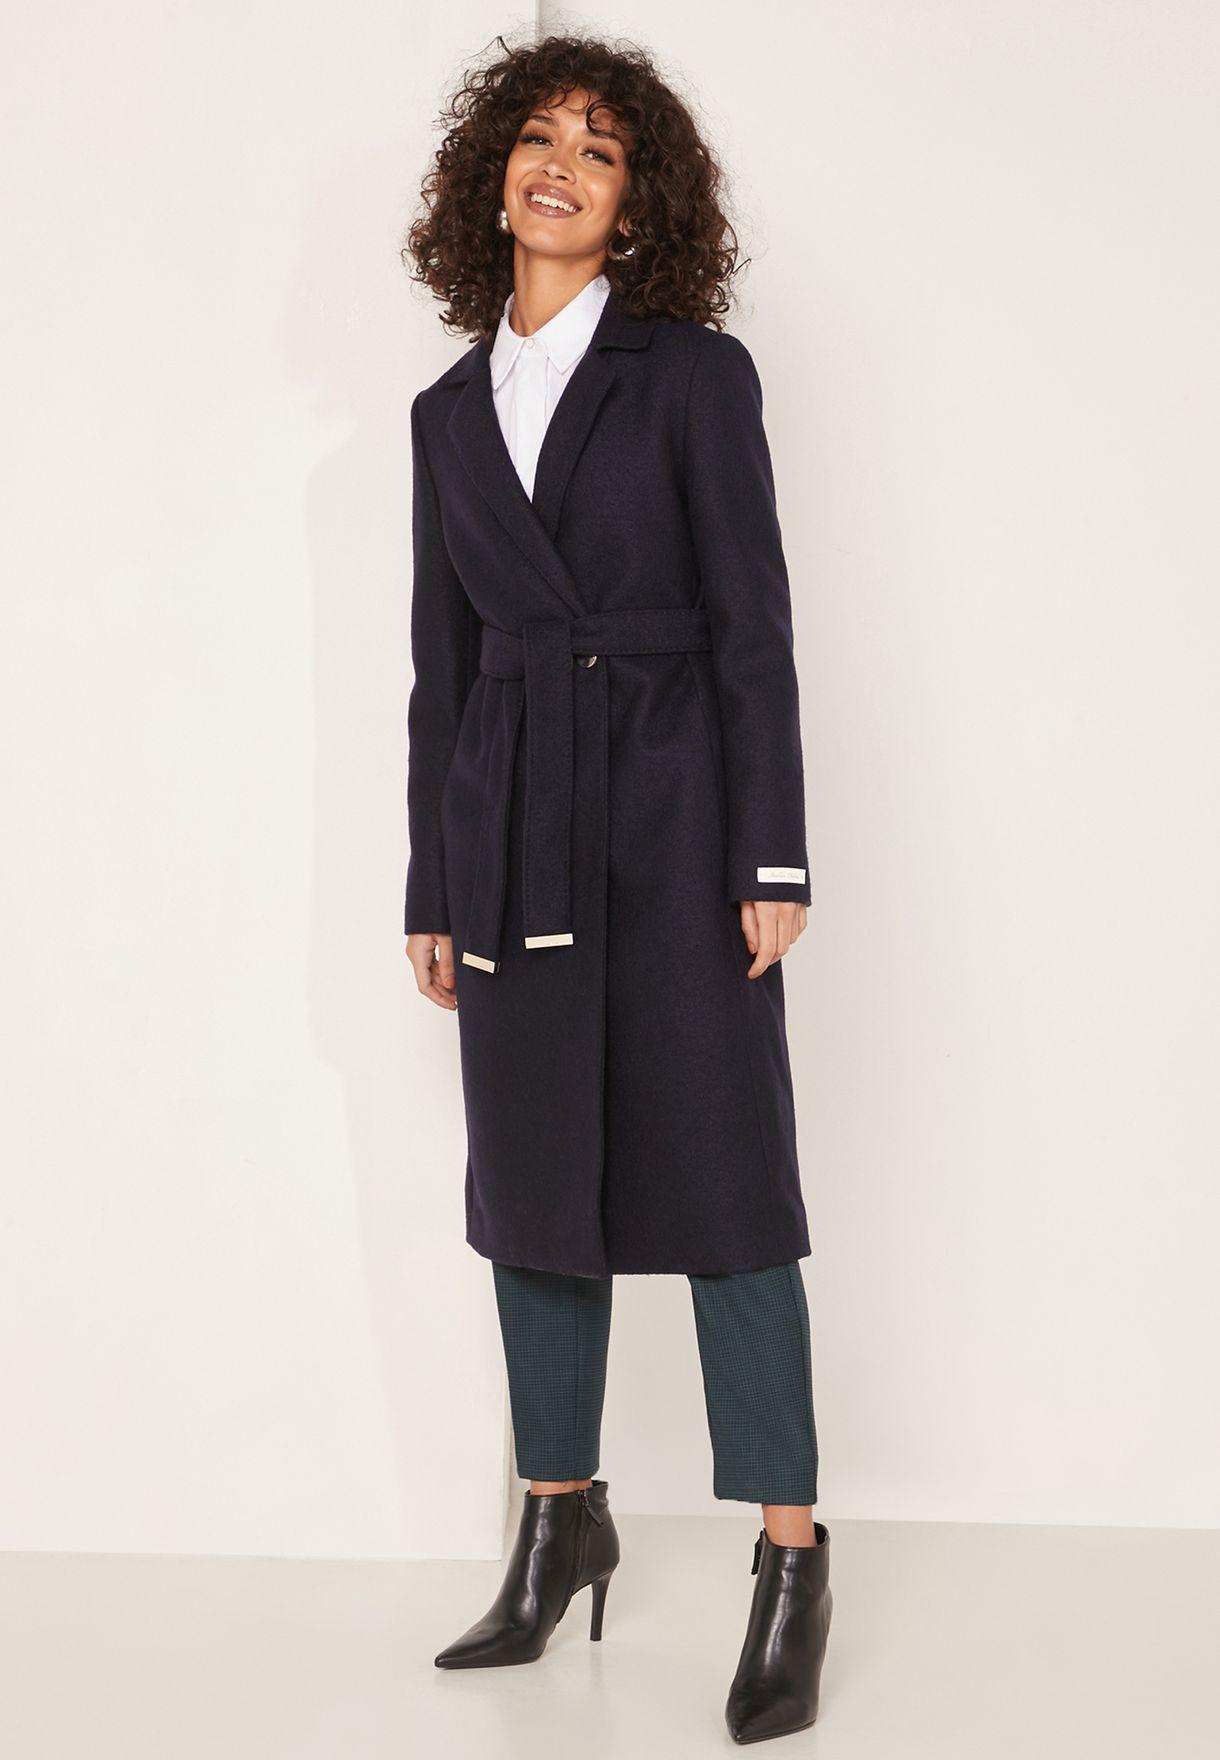 معطف طويل لف بحزام